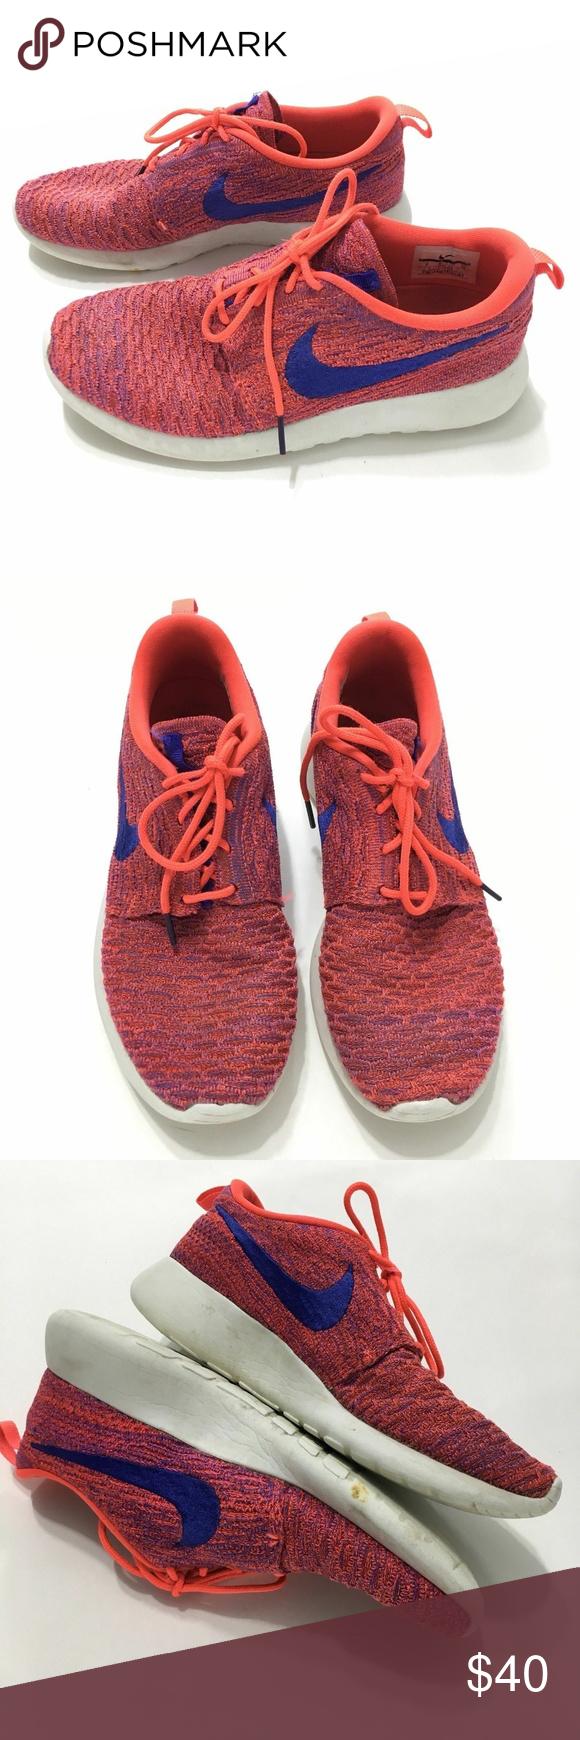 sale retailer 4c8e3 d3b63 Nike Roshe One Flyknit Shoes Running Orange Sz 8 Nike Womens Roshe One  Flyknit Shoes Running Orange Pink Blue Neon Size 8 Some scuffs. soles show  wear Nike ...